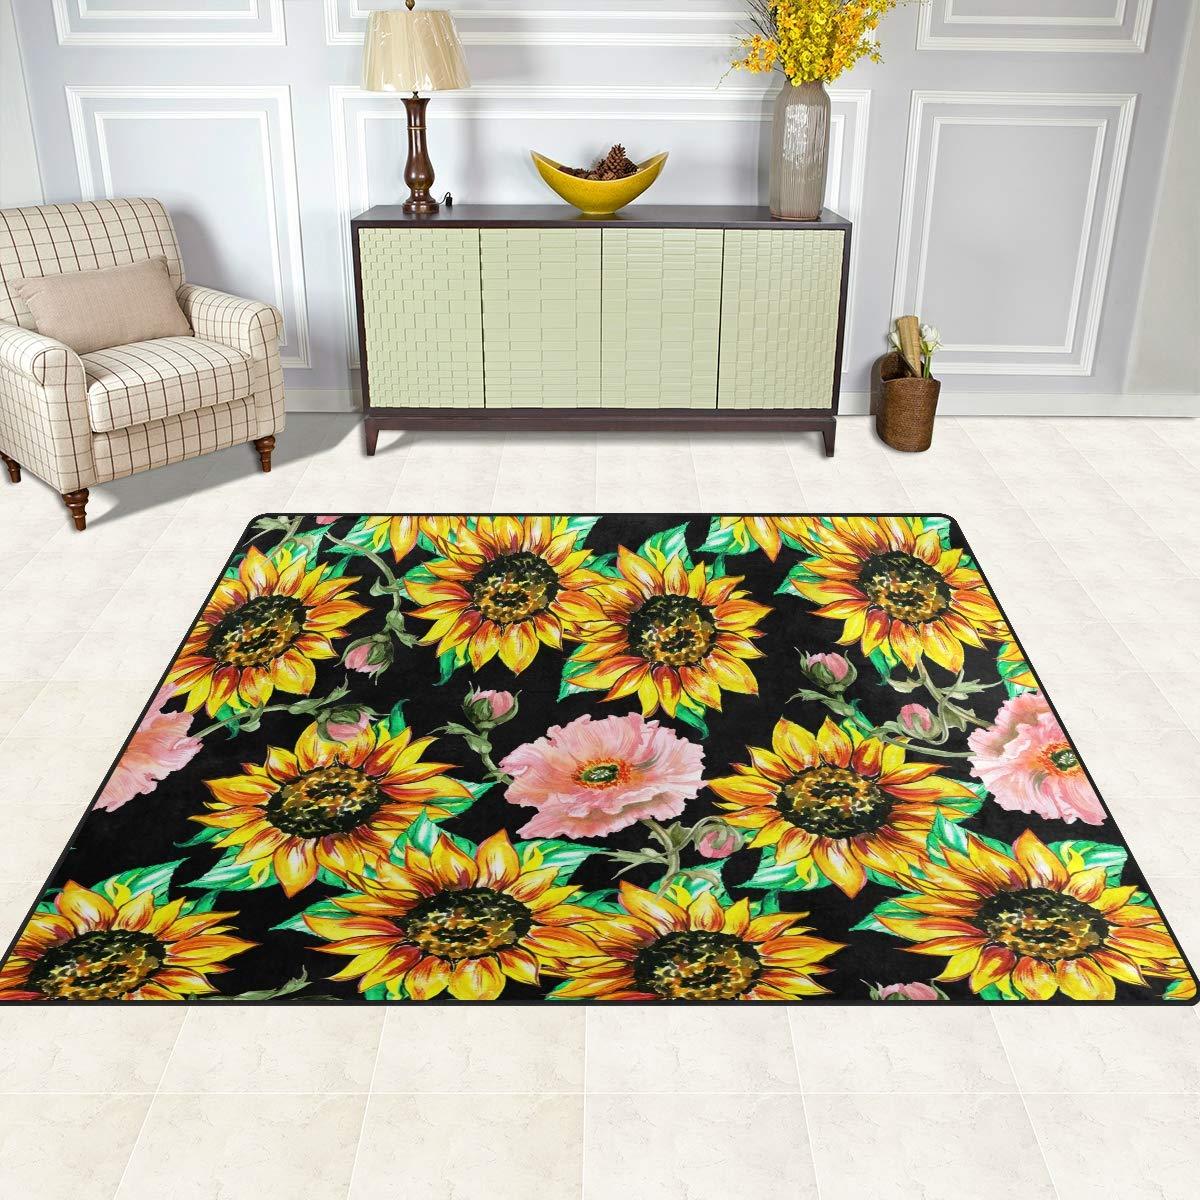 ALAZA Sunflower Red Poppy Area Rug Soft Non Slip Floor Mat Washable Carpet for Bedroom Living Room 1 Piece 5x7 Feet